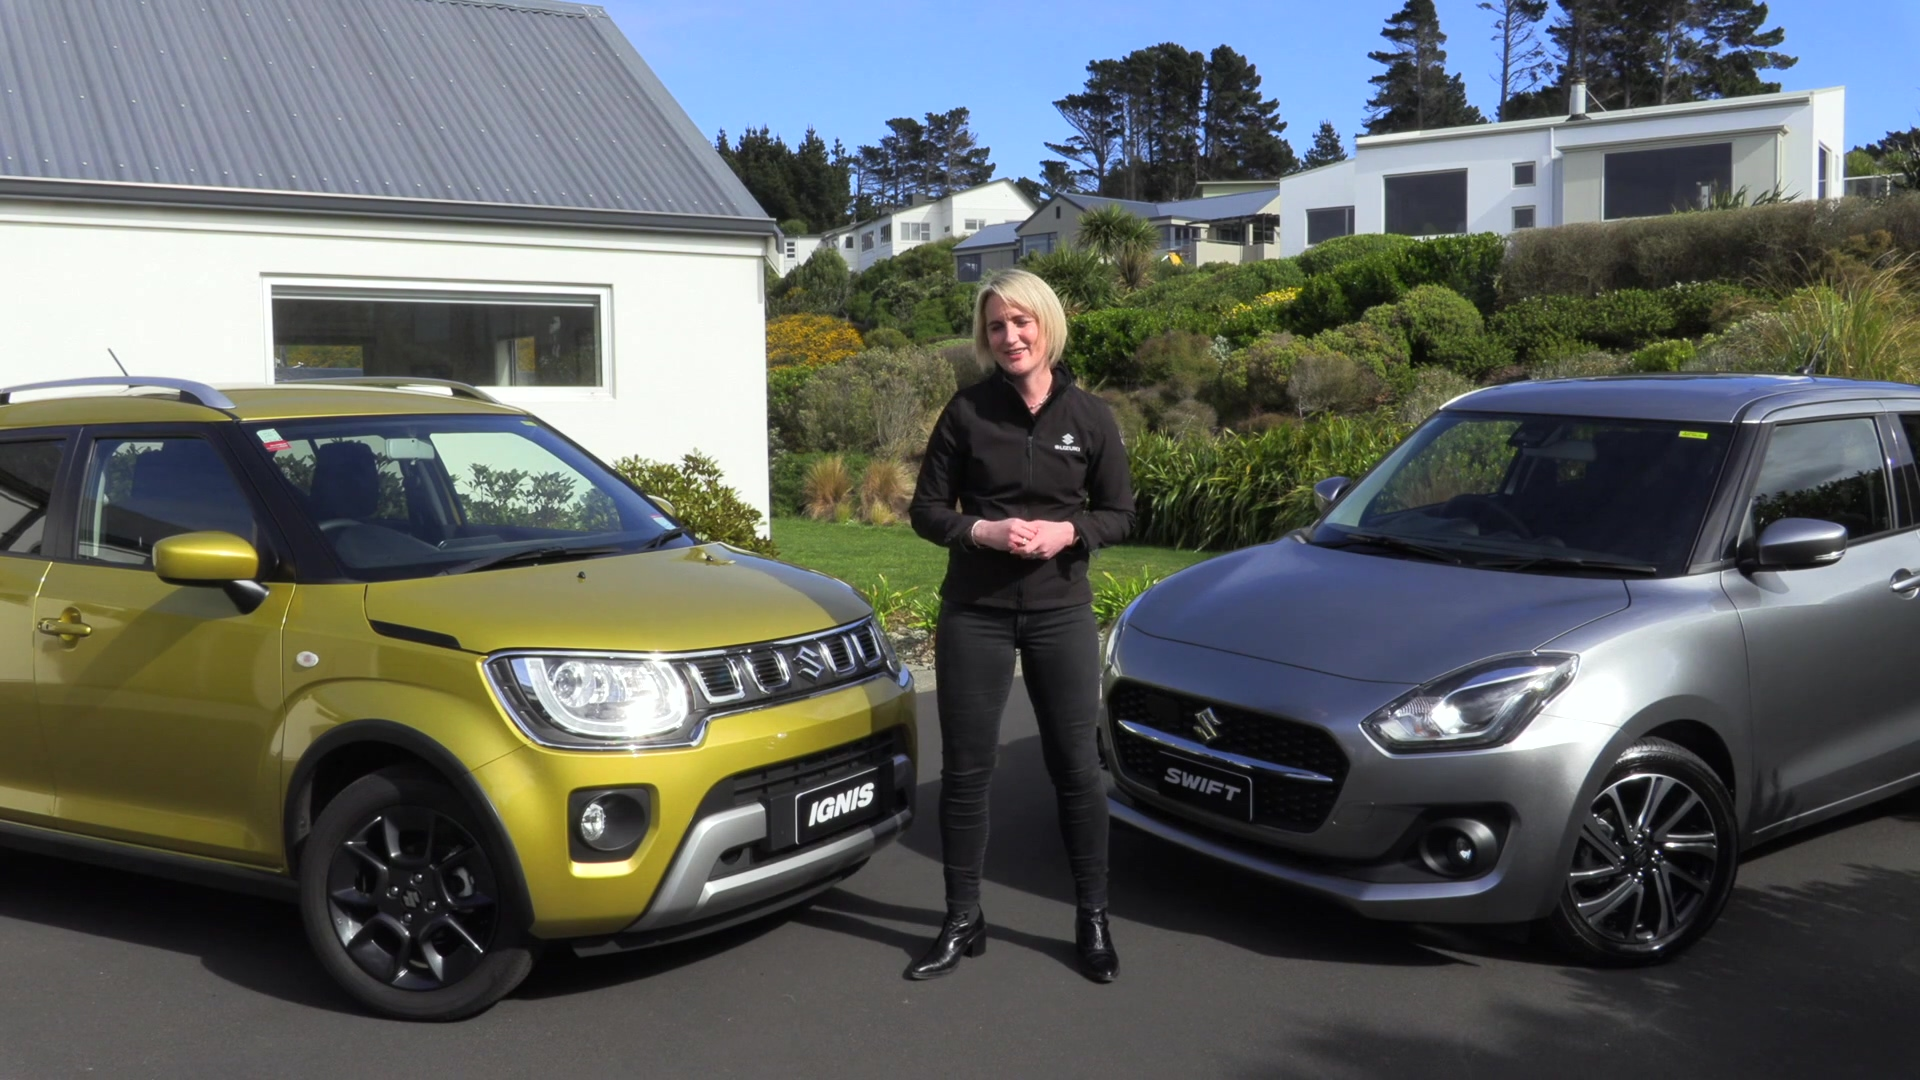 Suzuki Ignis LTD and Swift RS-thumb